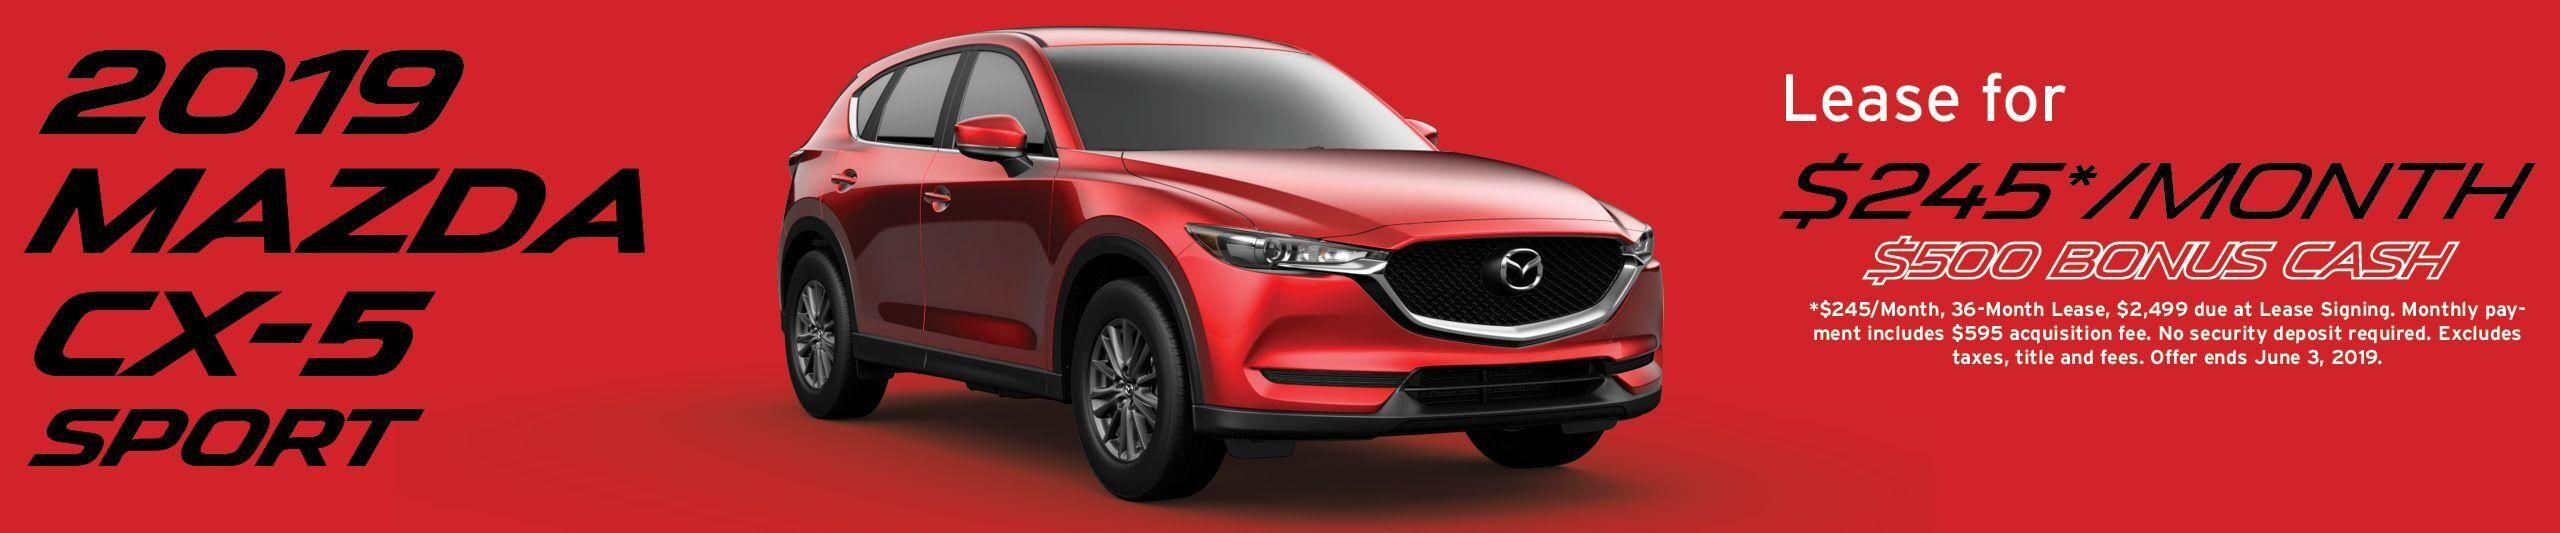 2019 Mazda CX-5 lease banner